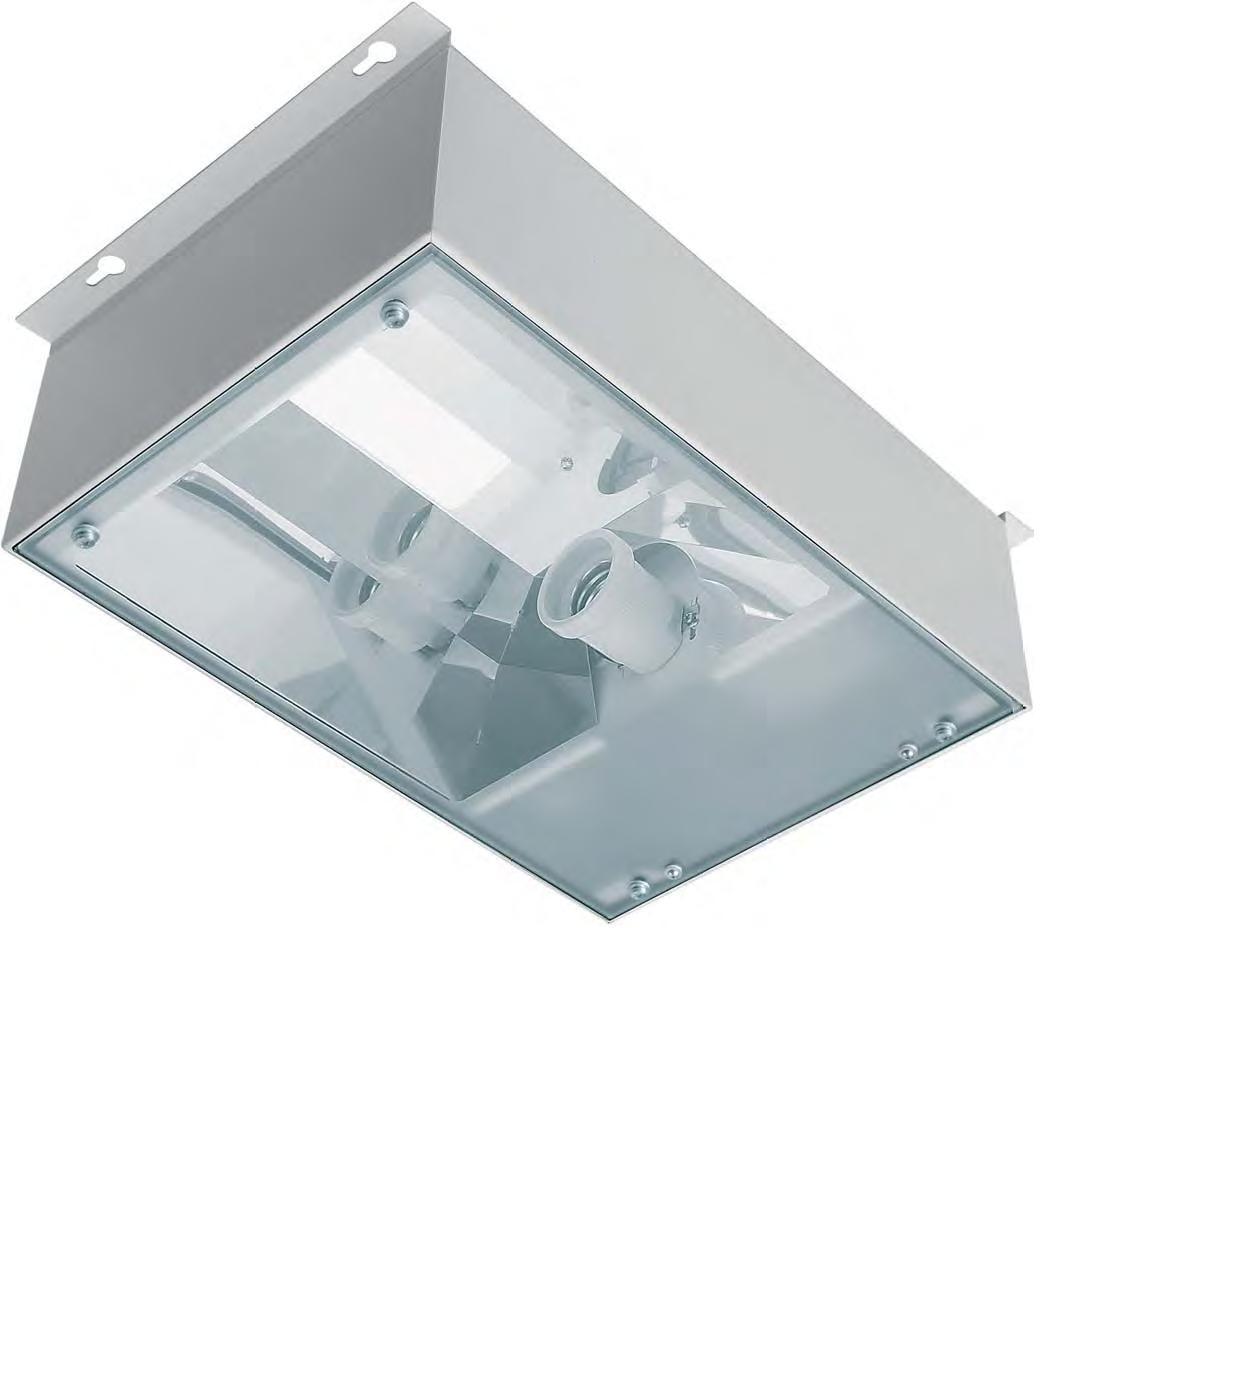 1 Stk SBOX AB 1x150W, HS/HI, VVG, E40, IP65, RAL9003 LI99001425